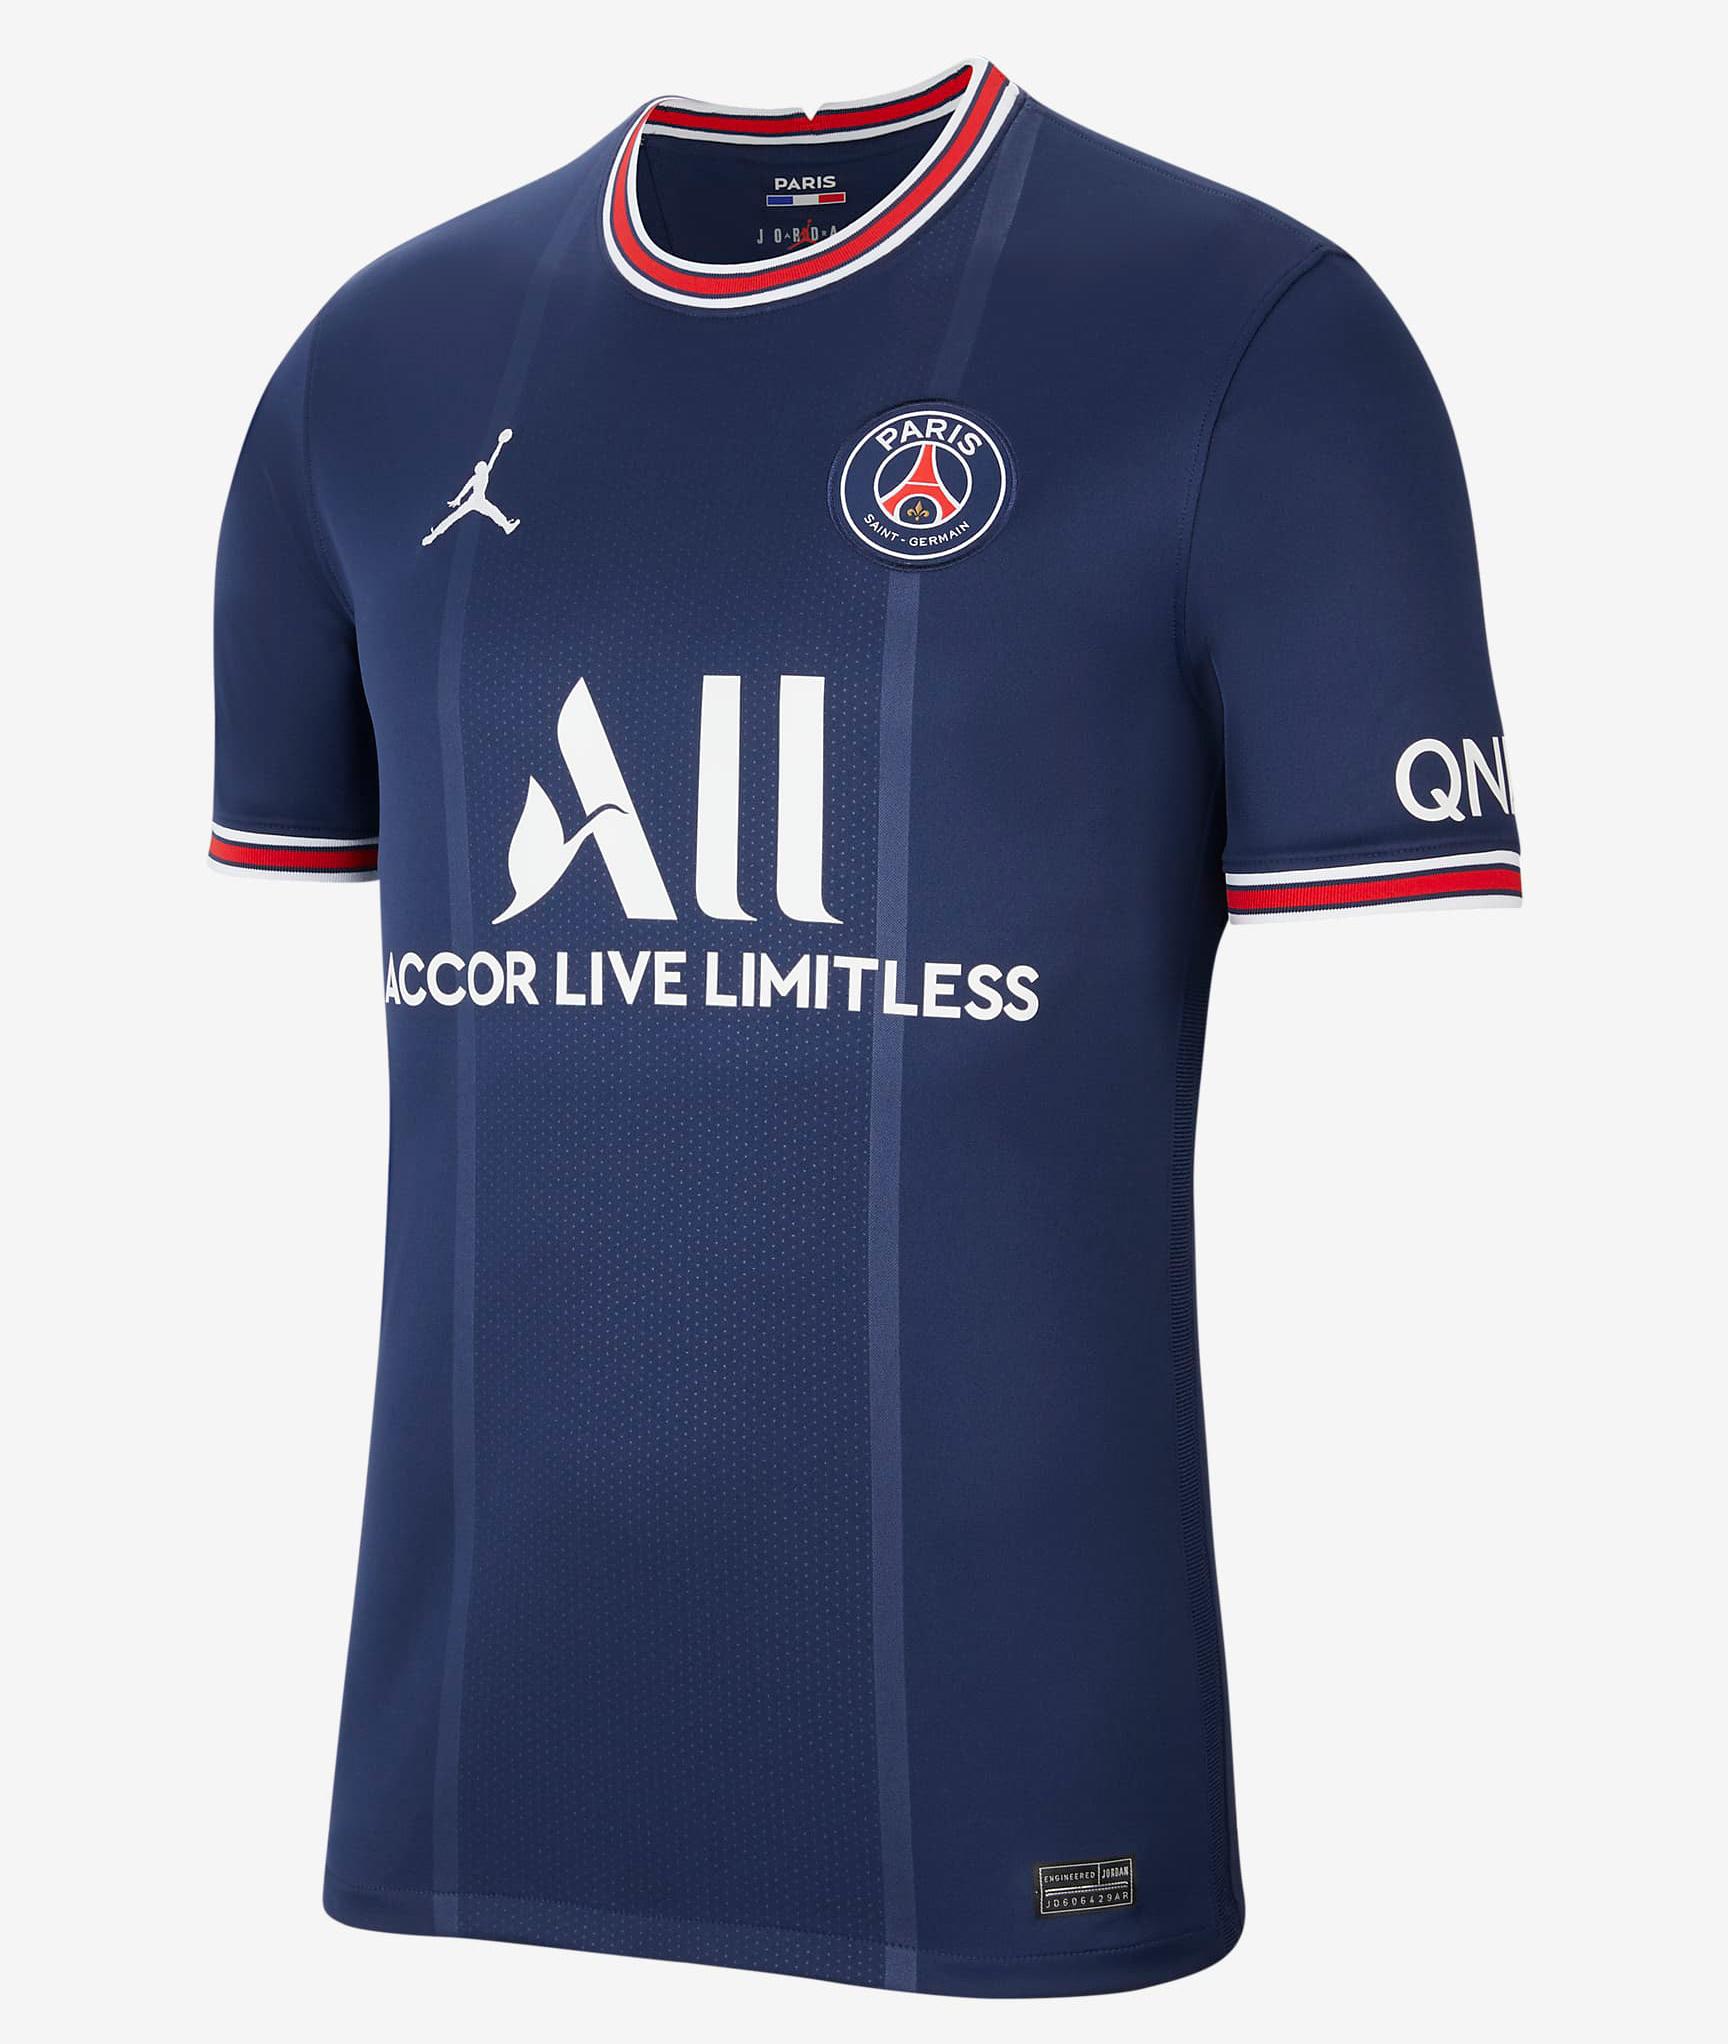 air-jordan-7-psg-paris-saint-germain-stadium-jersey